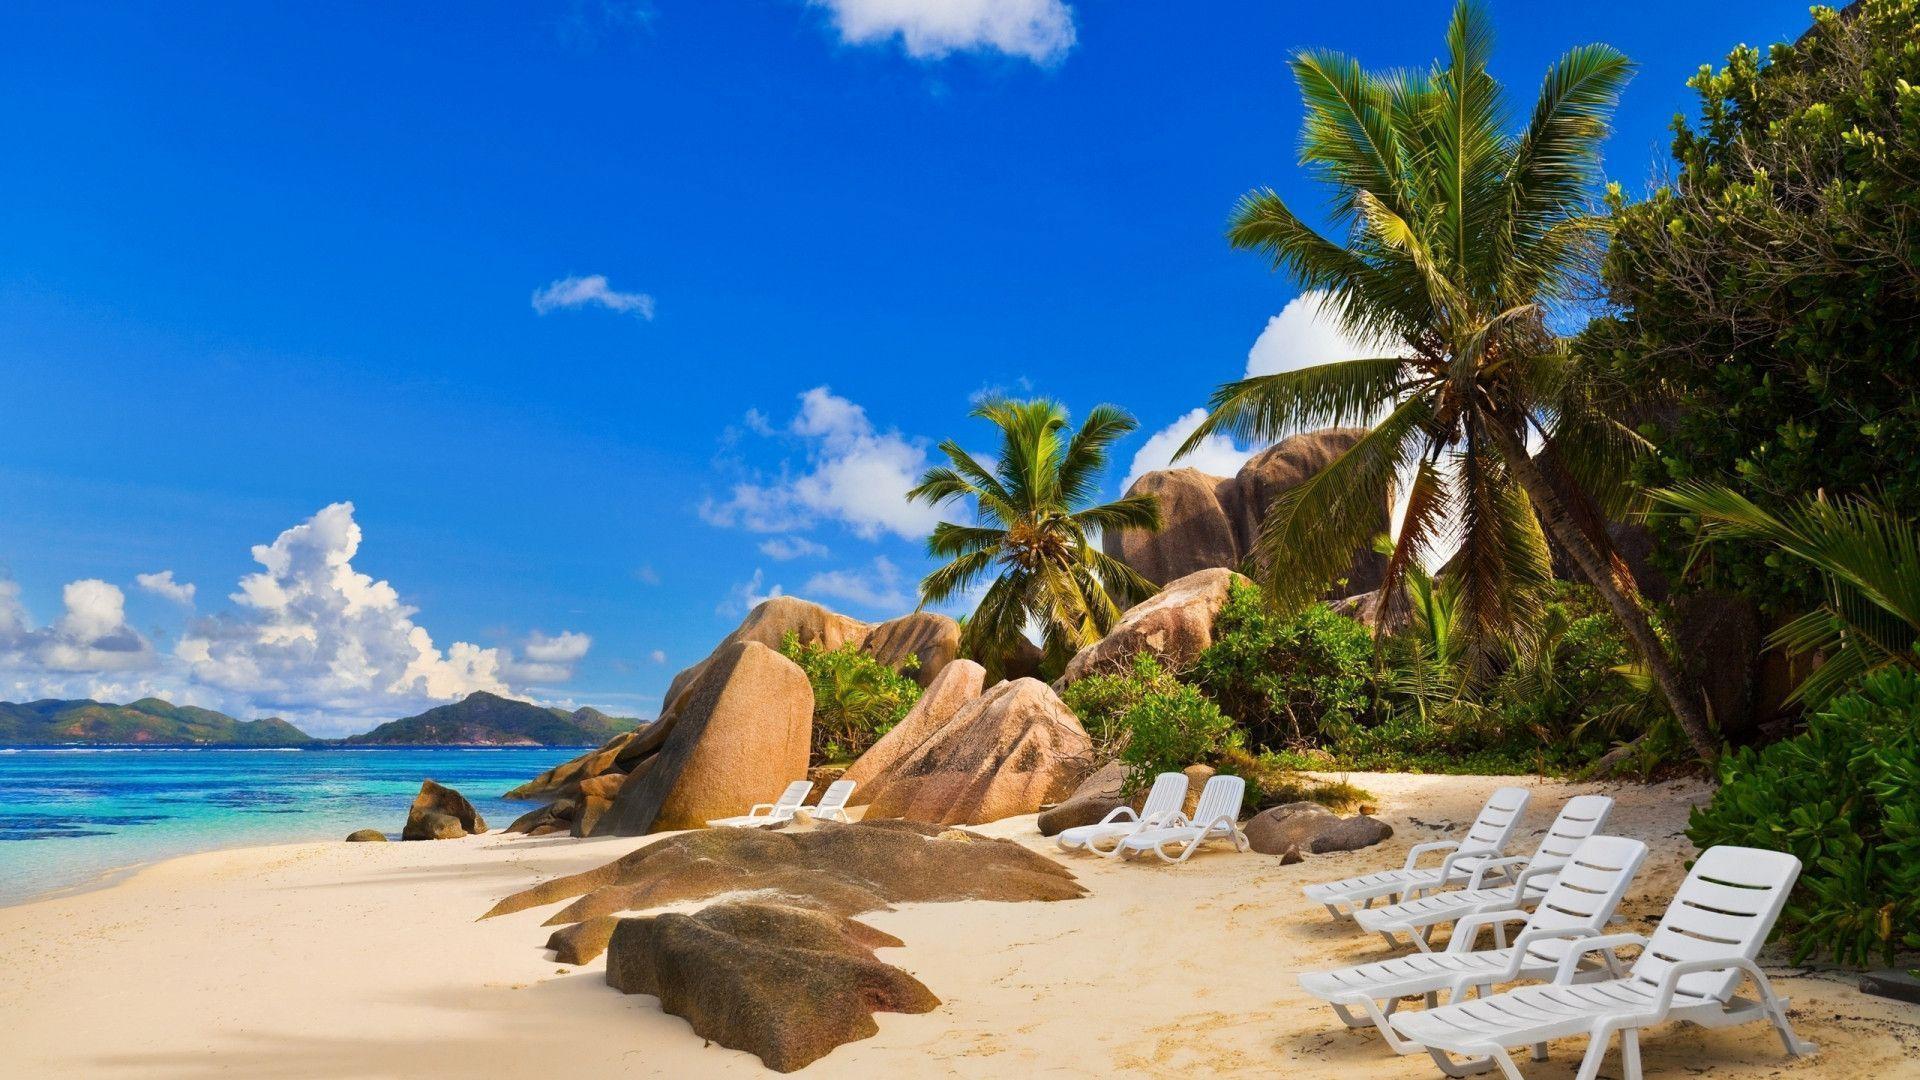 Exotic Sea Beach Wallpaper, HD, Sea Beach HD Widescreen Wallpapers .